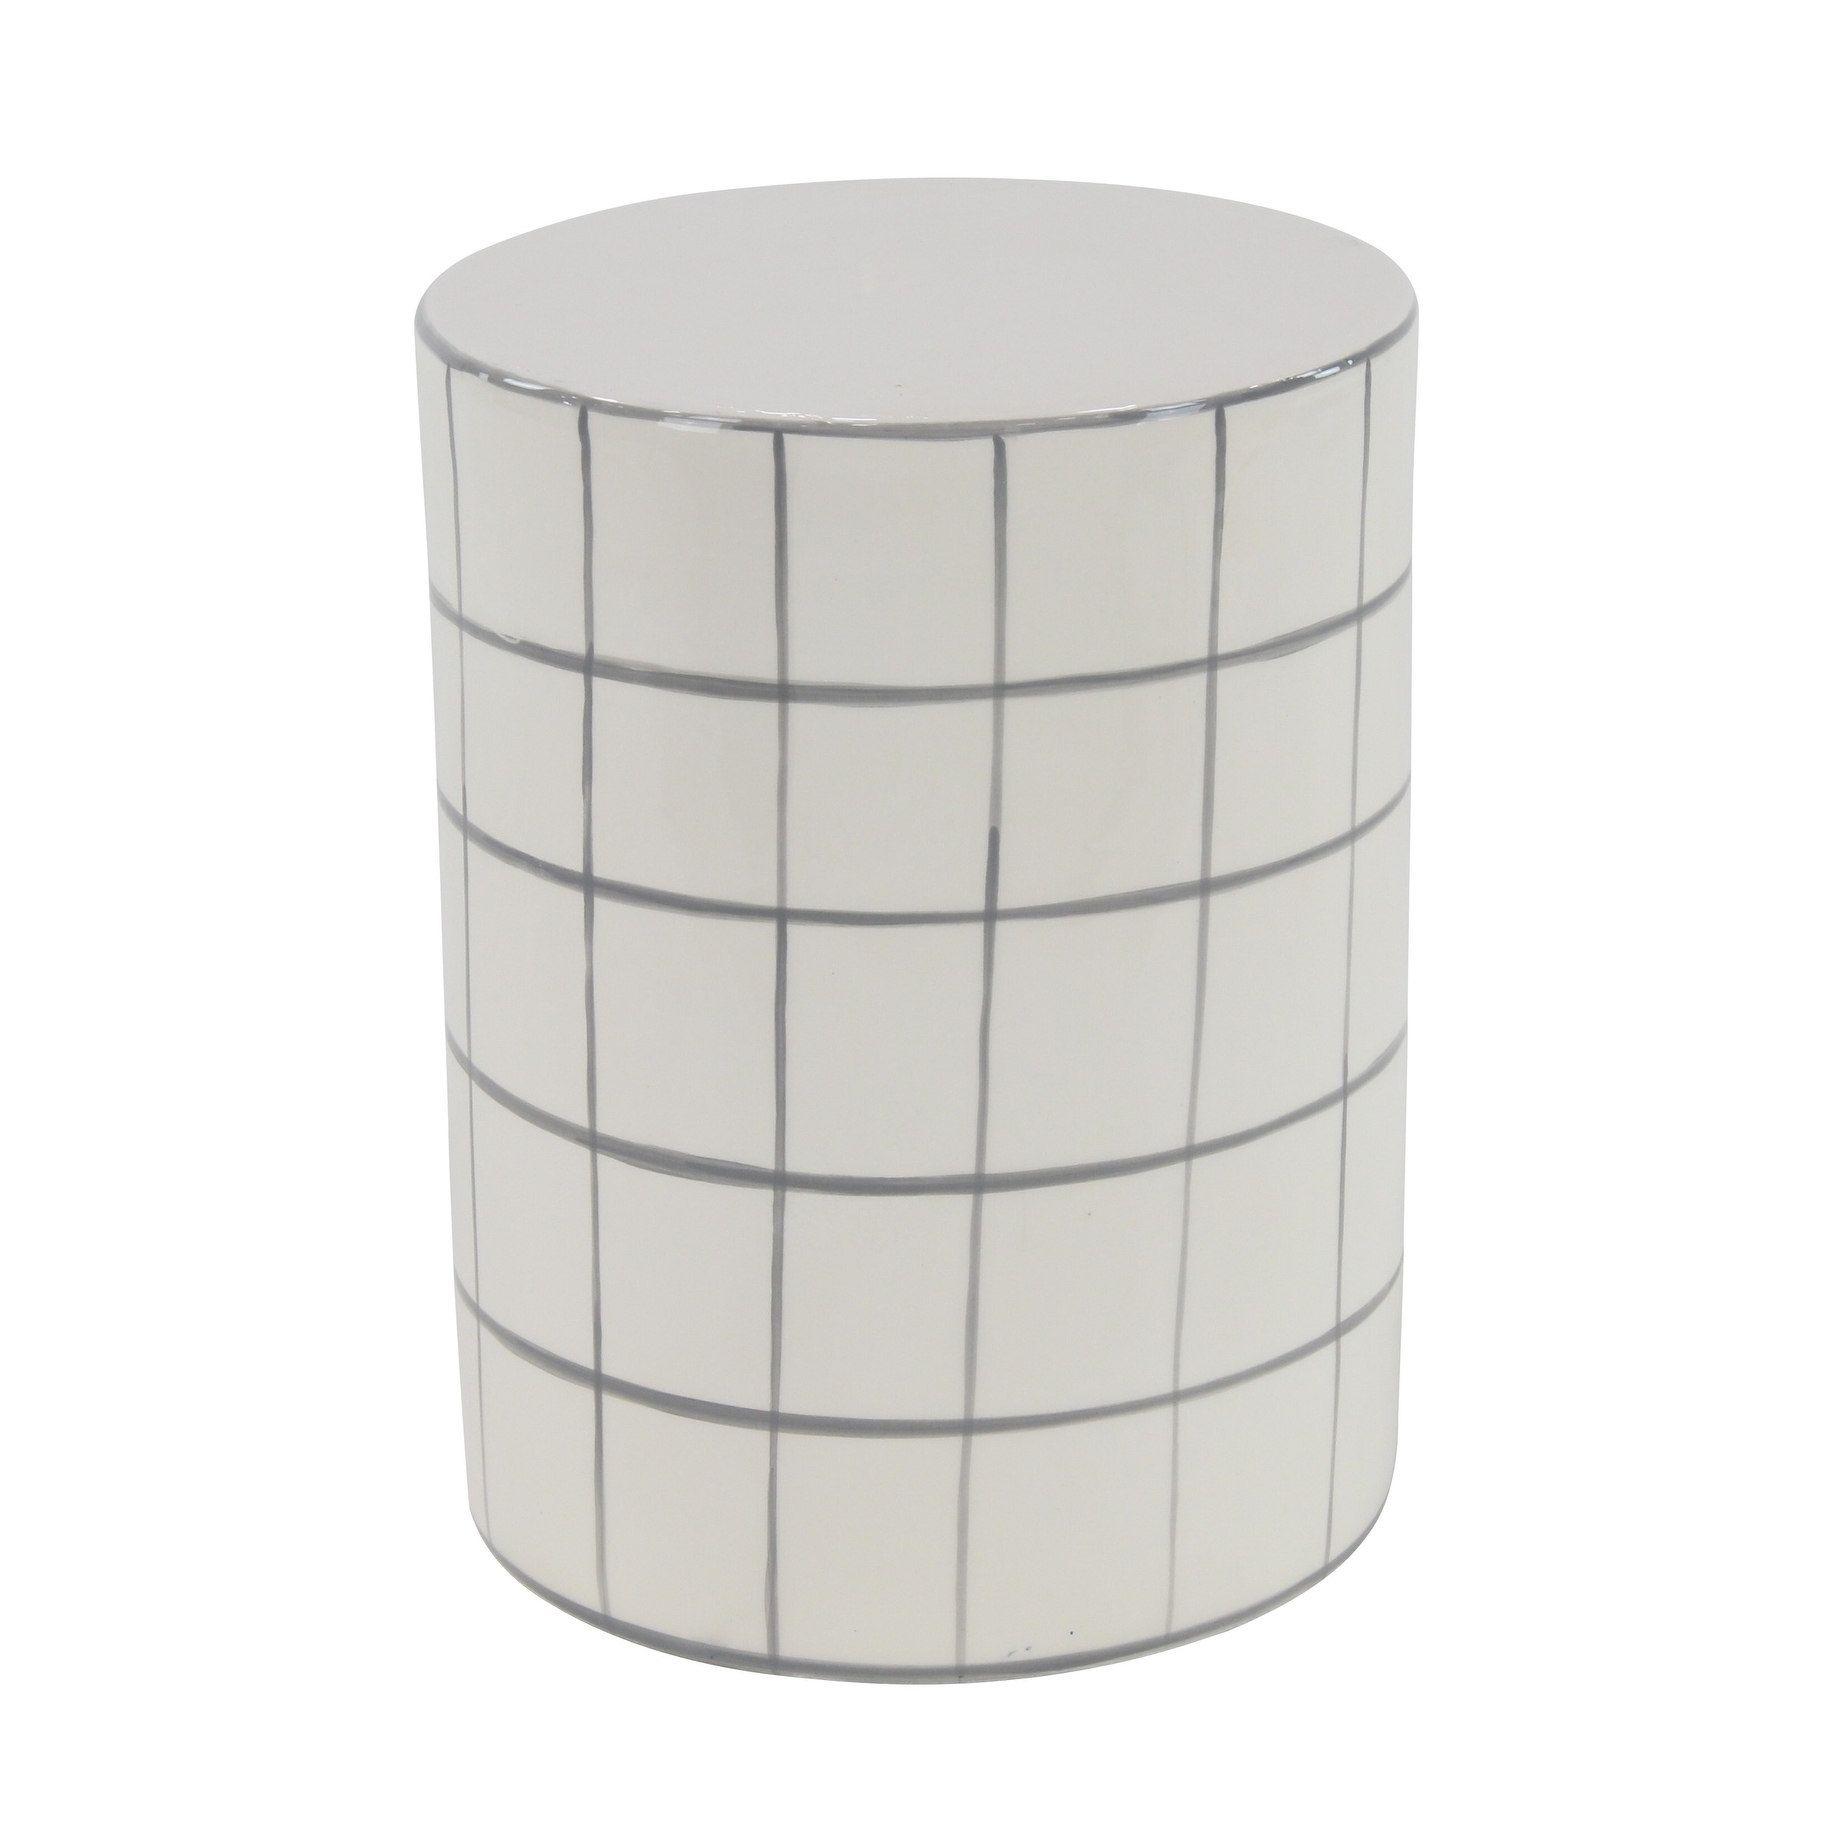 Enjoyable Modern 16 X 12 Inch White Cylindrical Ceramic Stool Studio Theyellowbook Wood Chair Design Ideas Theyellowbookinfo